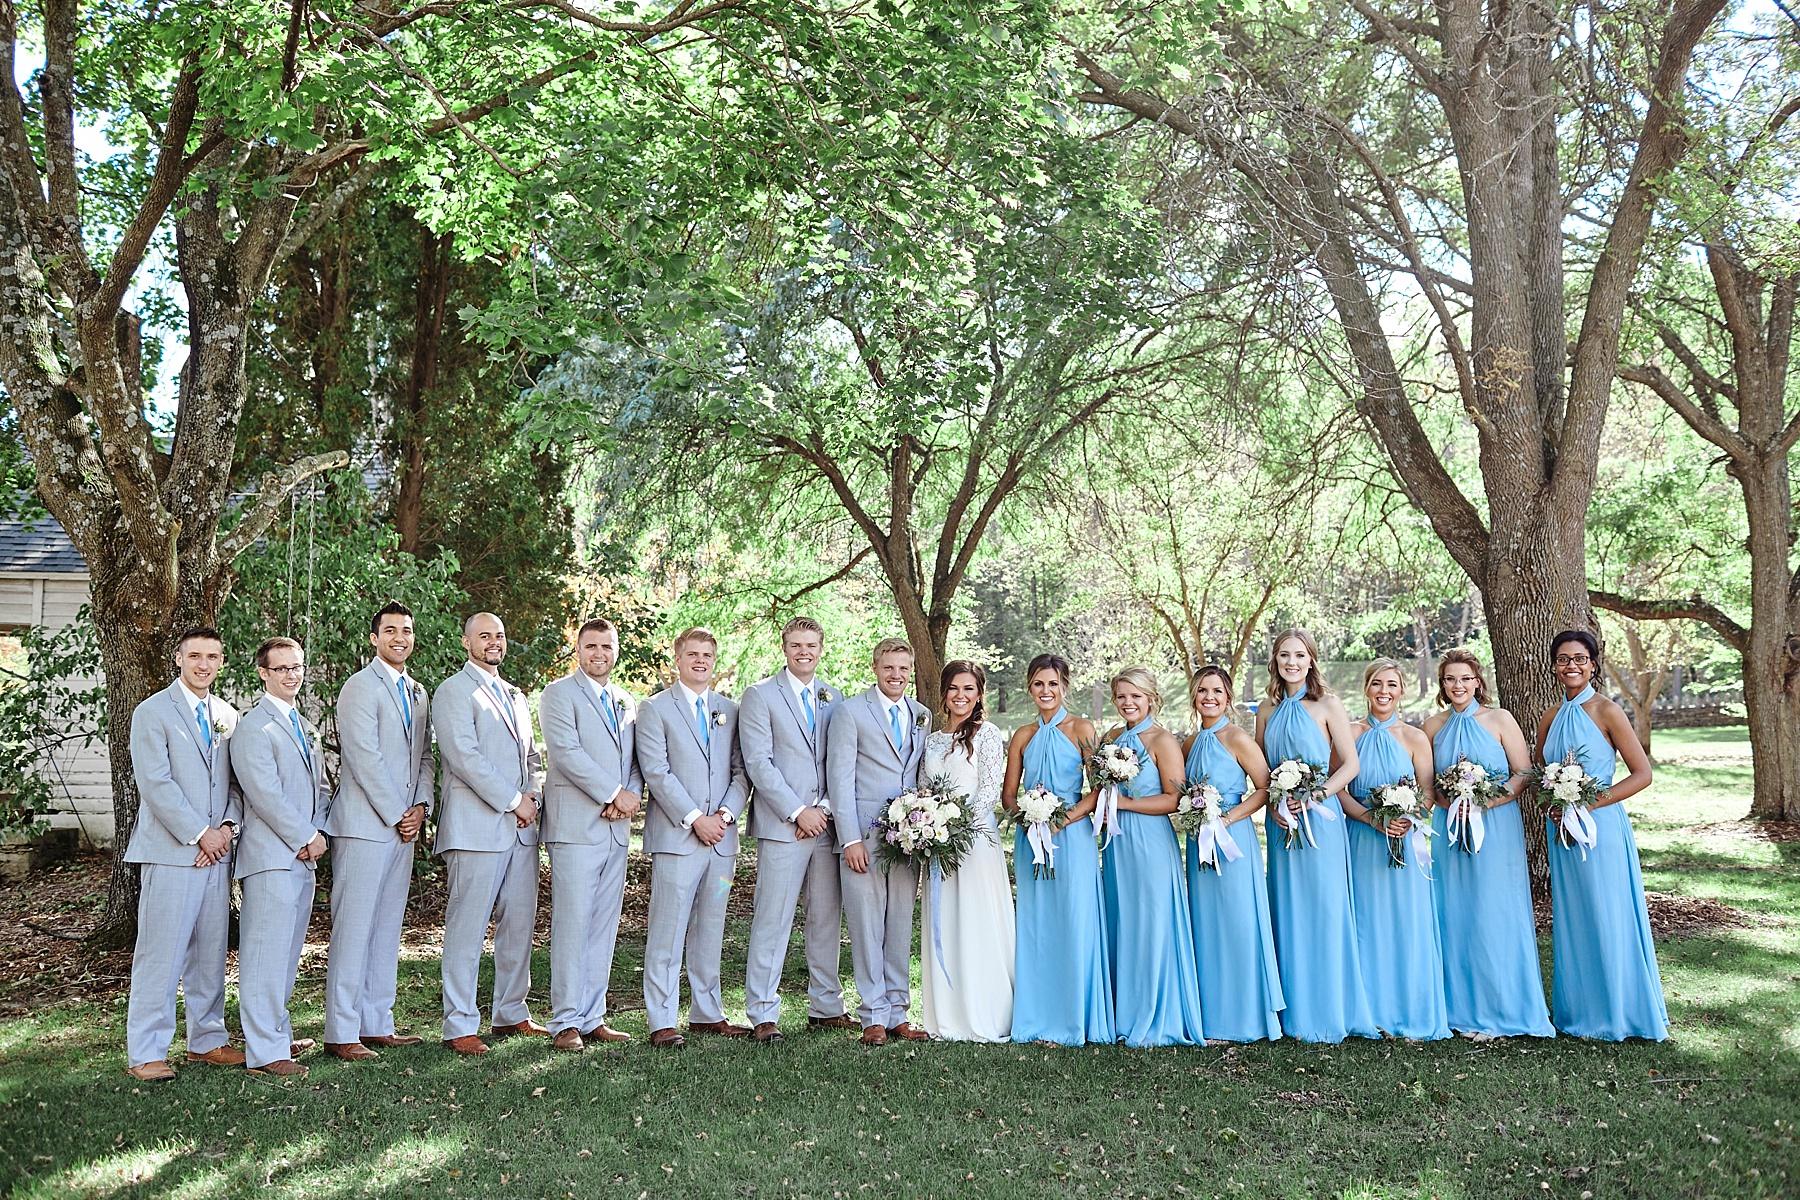 Maywood-Stone-Barn-Wedding-Rochester-Minnesota-Perry-James-Photo_0609.jpg